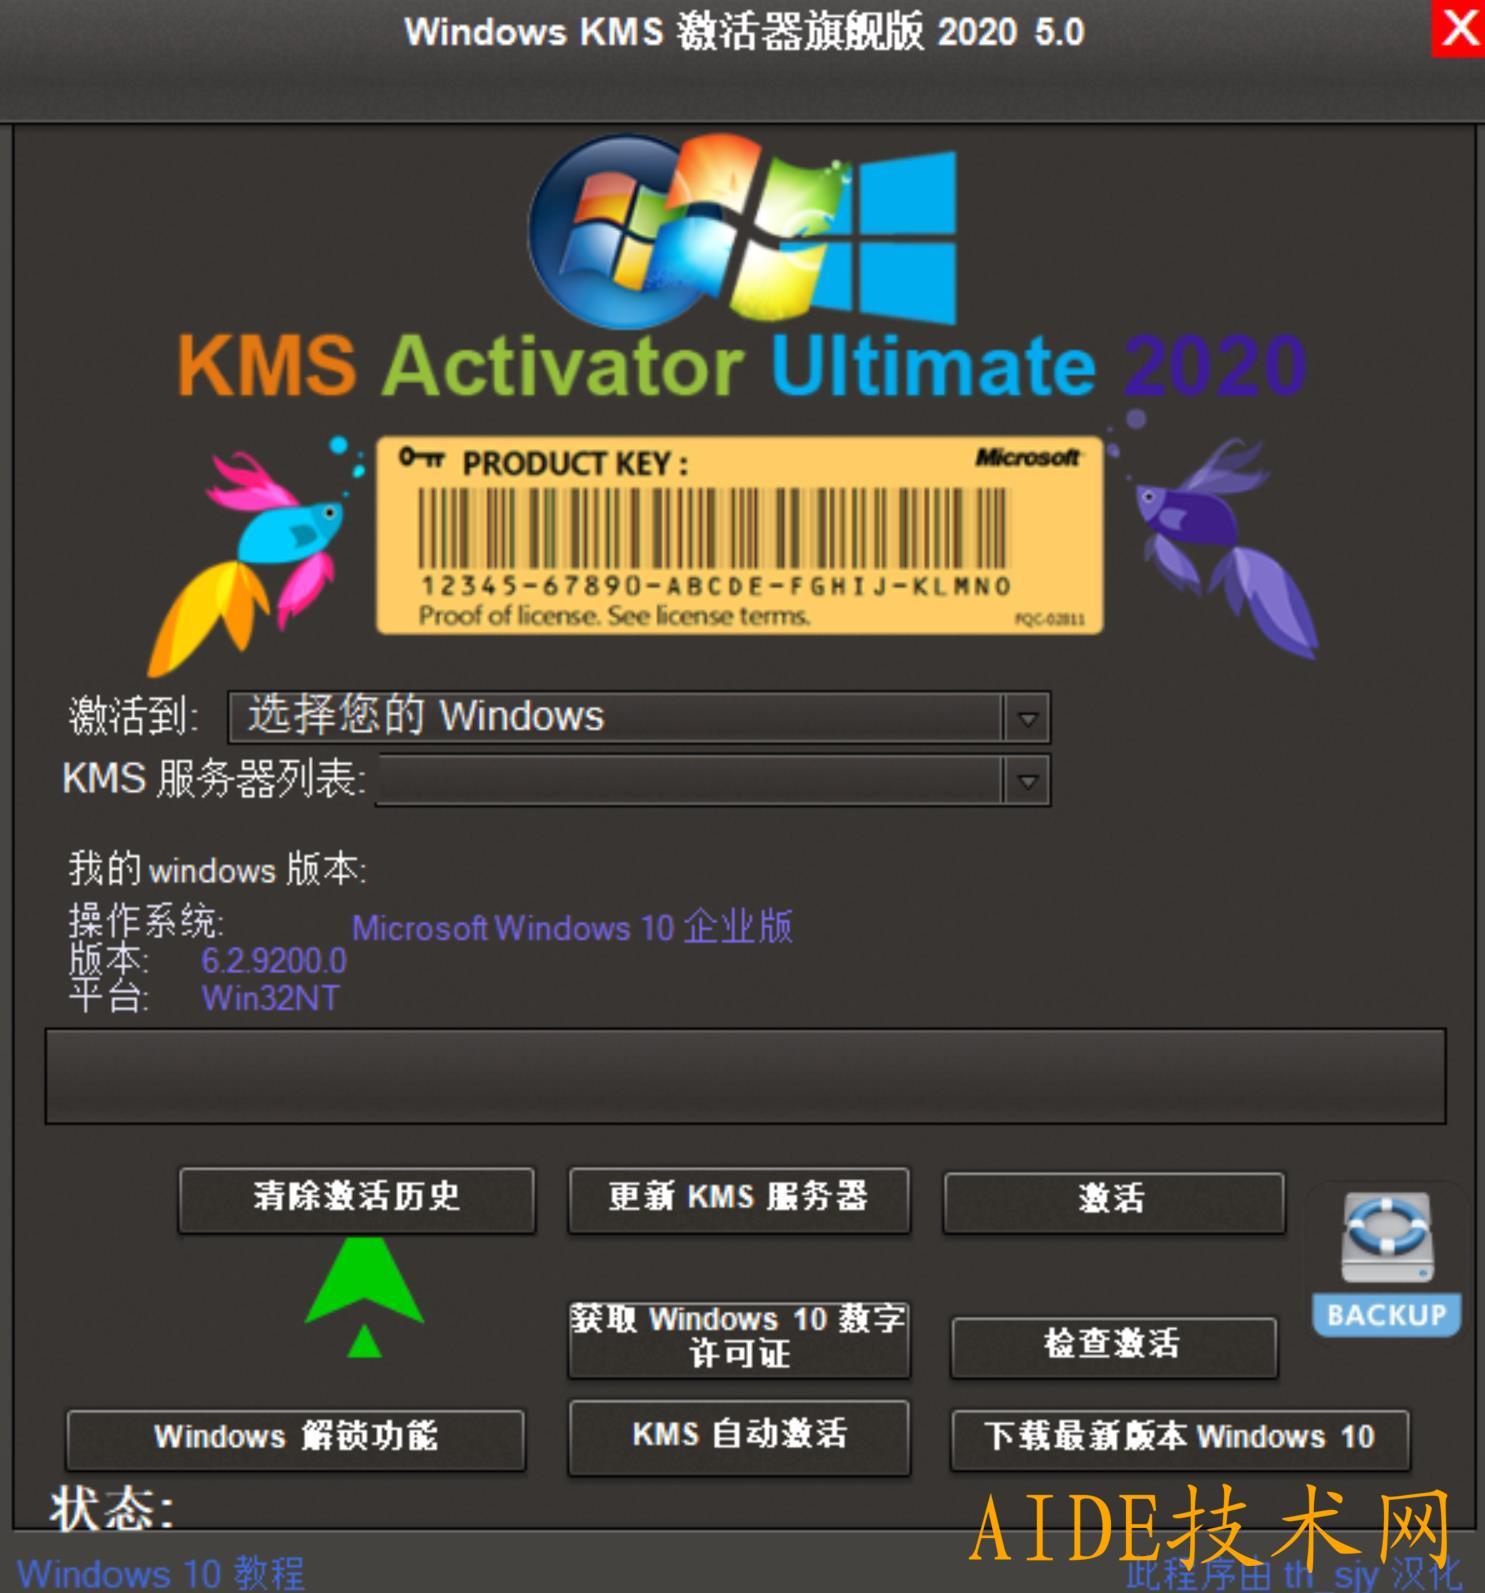 KMS旗舰版Windows全系统一键激活工具.zip